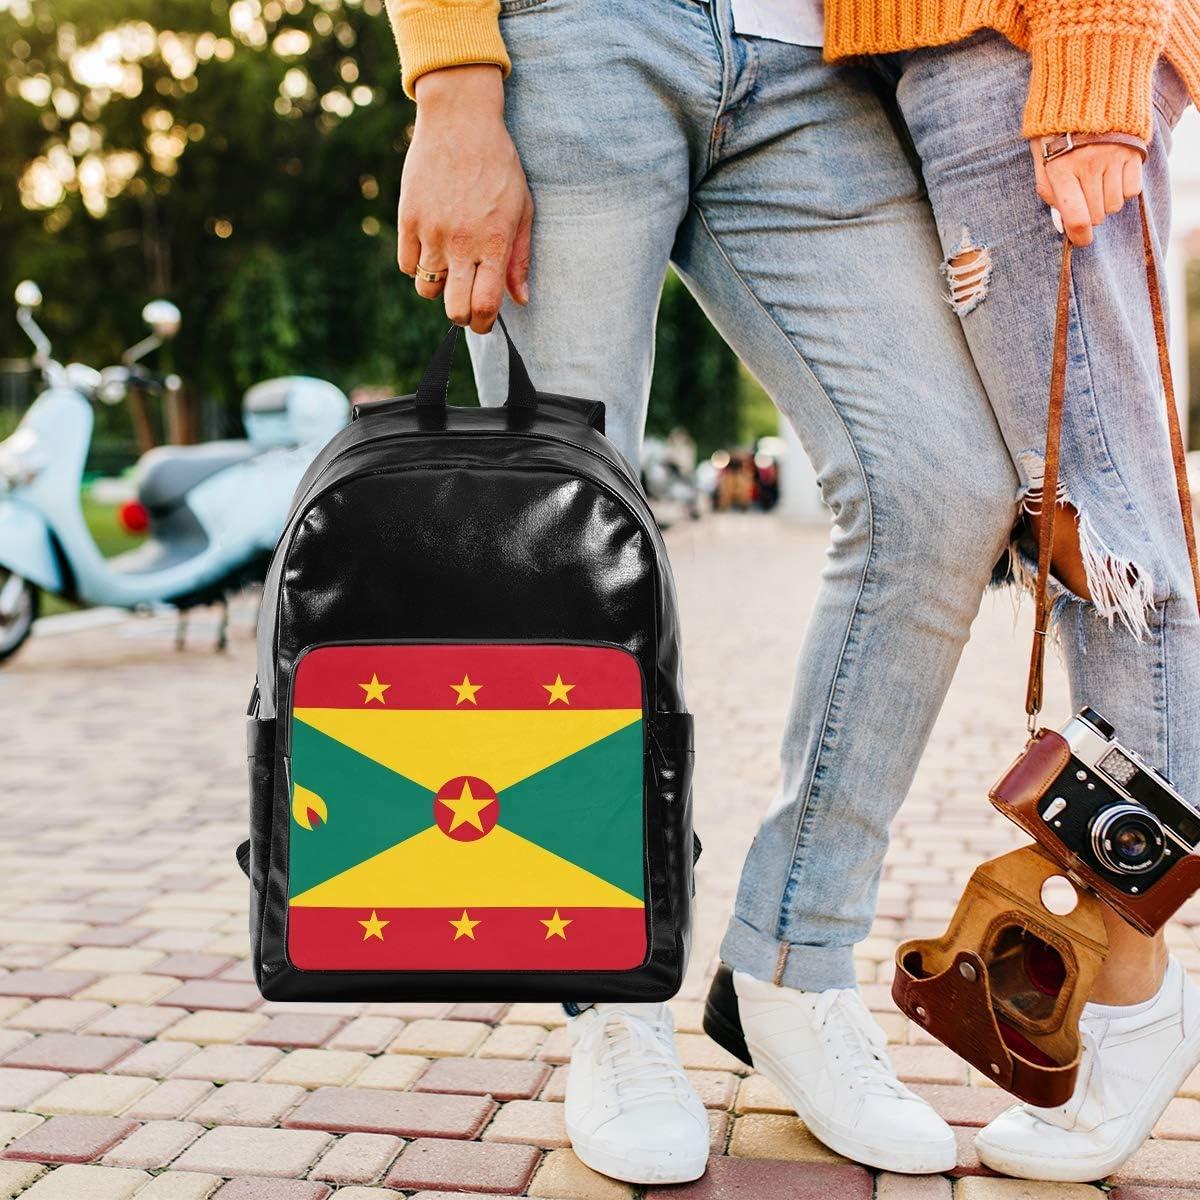 Solid 17.5 Inch Backpacks Stylish Waterproof Reflective Canvas Travel Laptop Backpack School Bookbag Guyana Flag